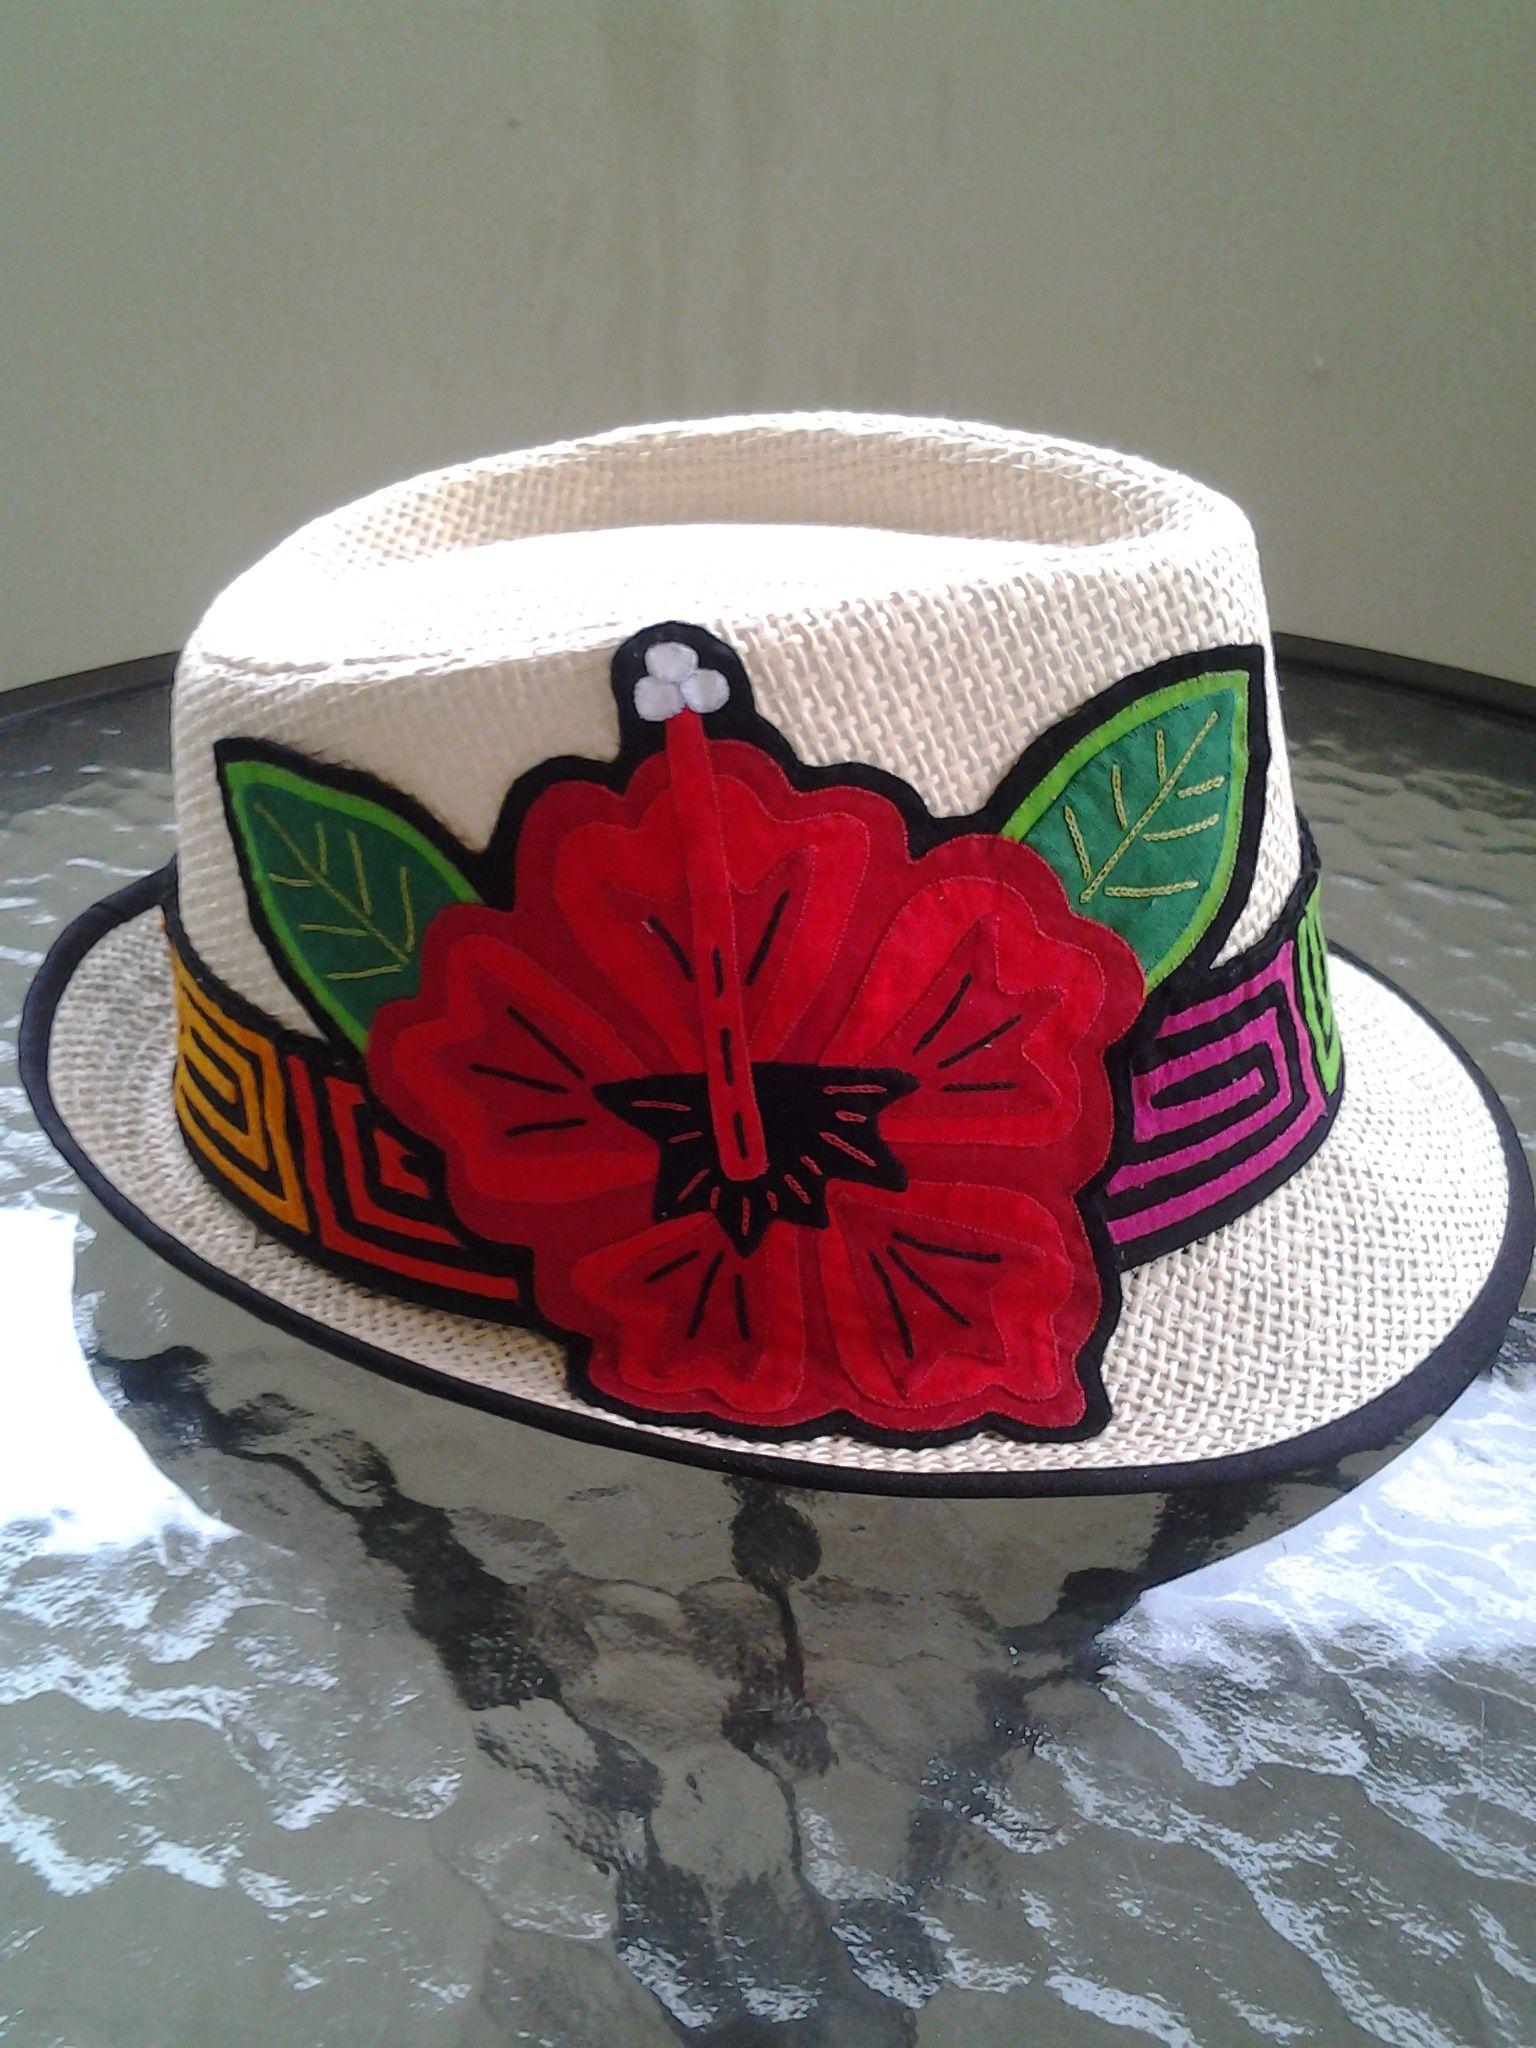 Accesorios Para El Cabello · Vendido Sombreros Pintados A Mano 2c302d9c80a